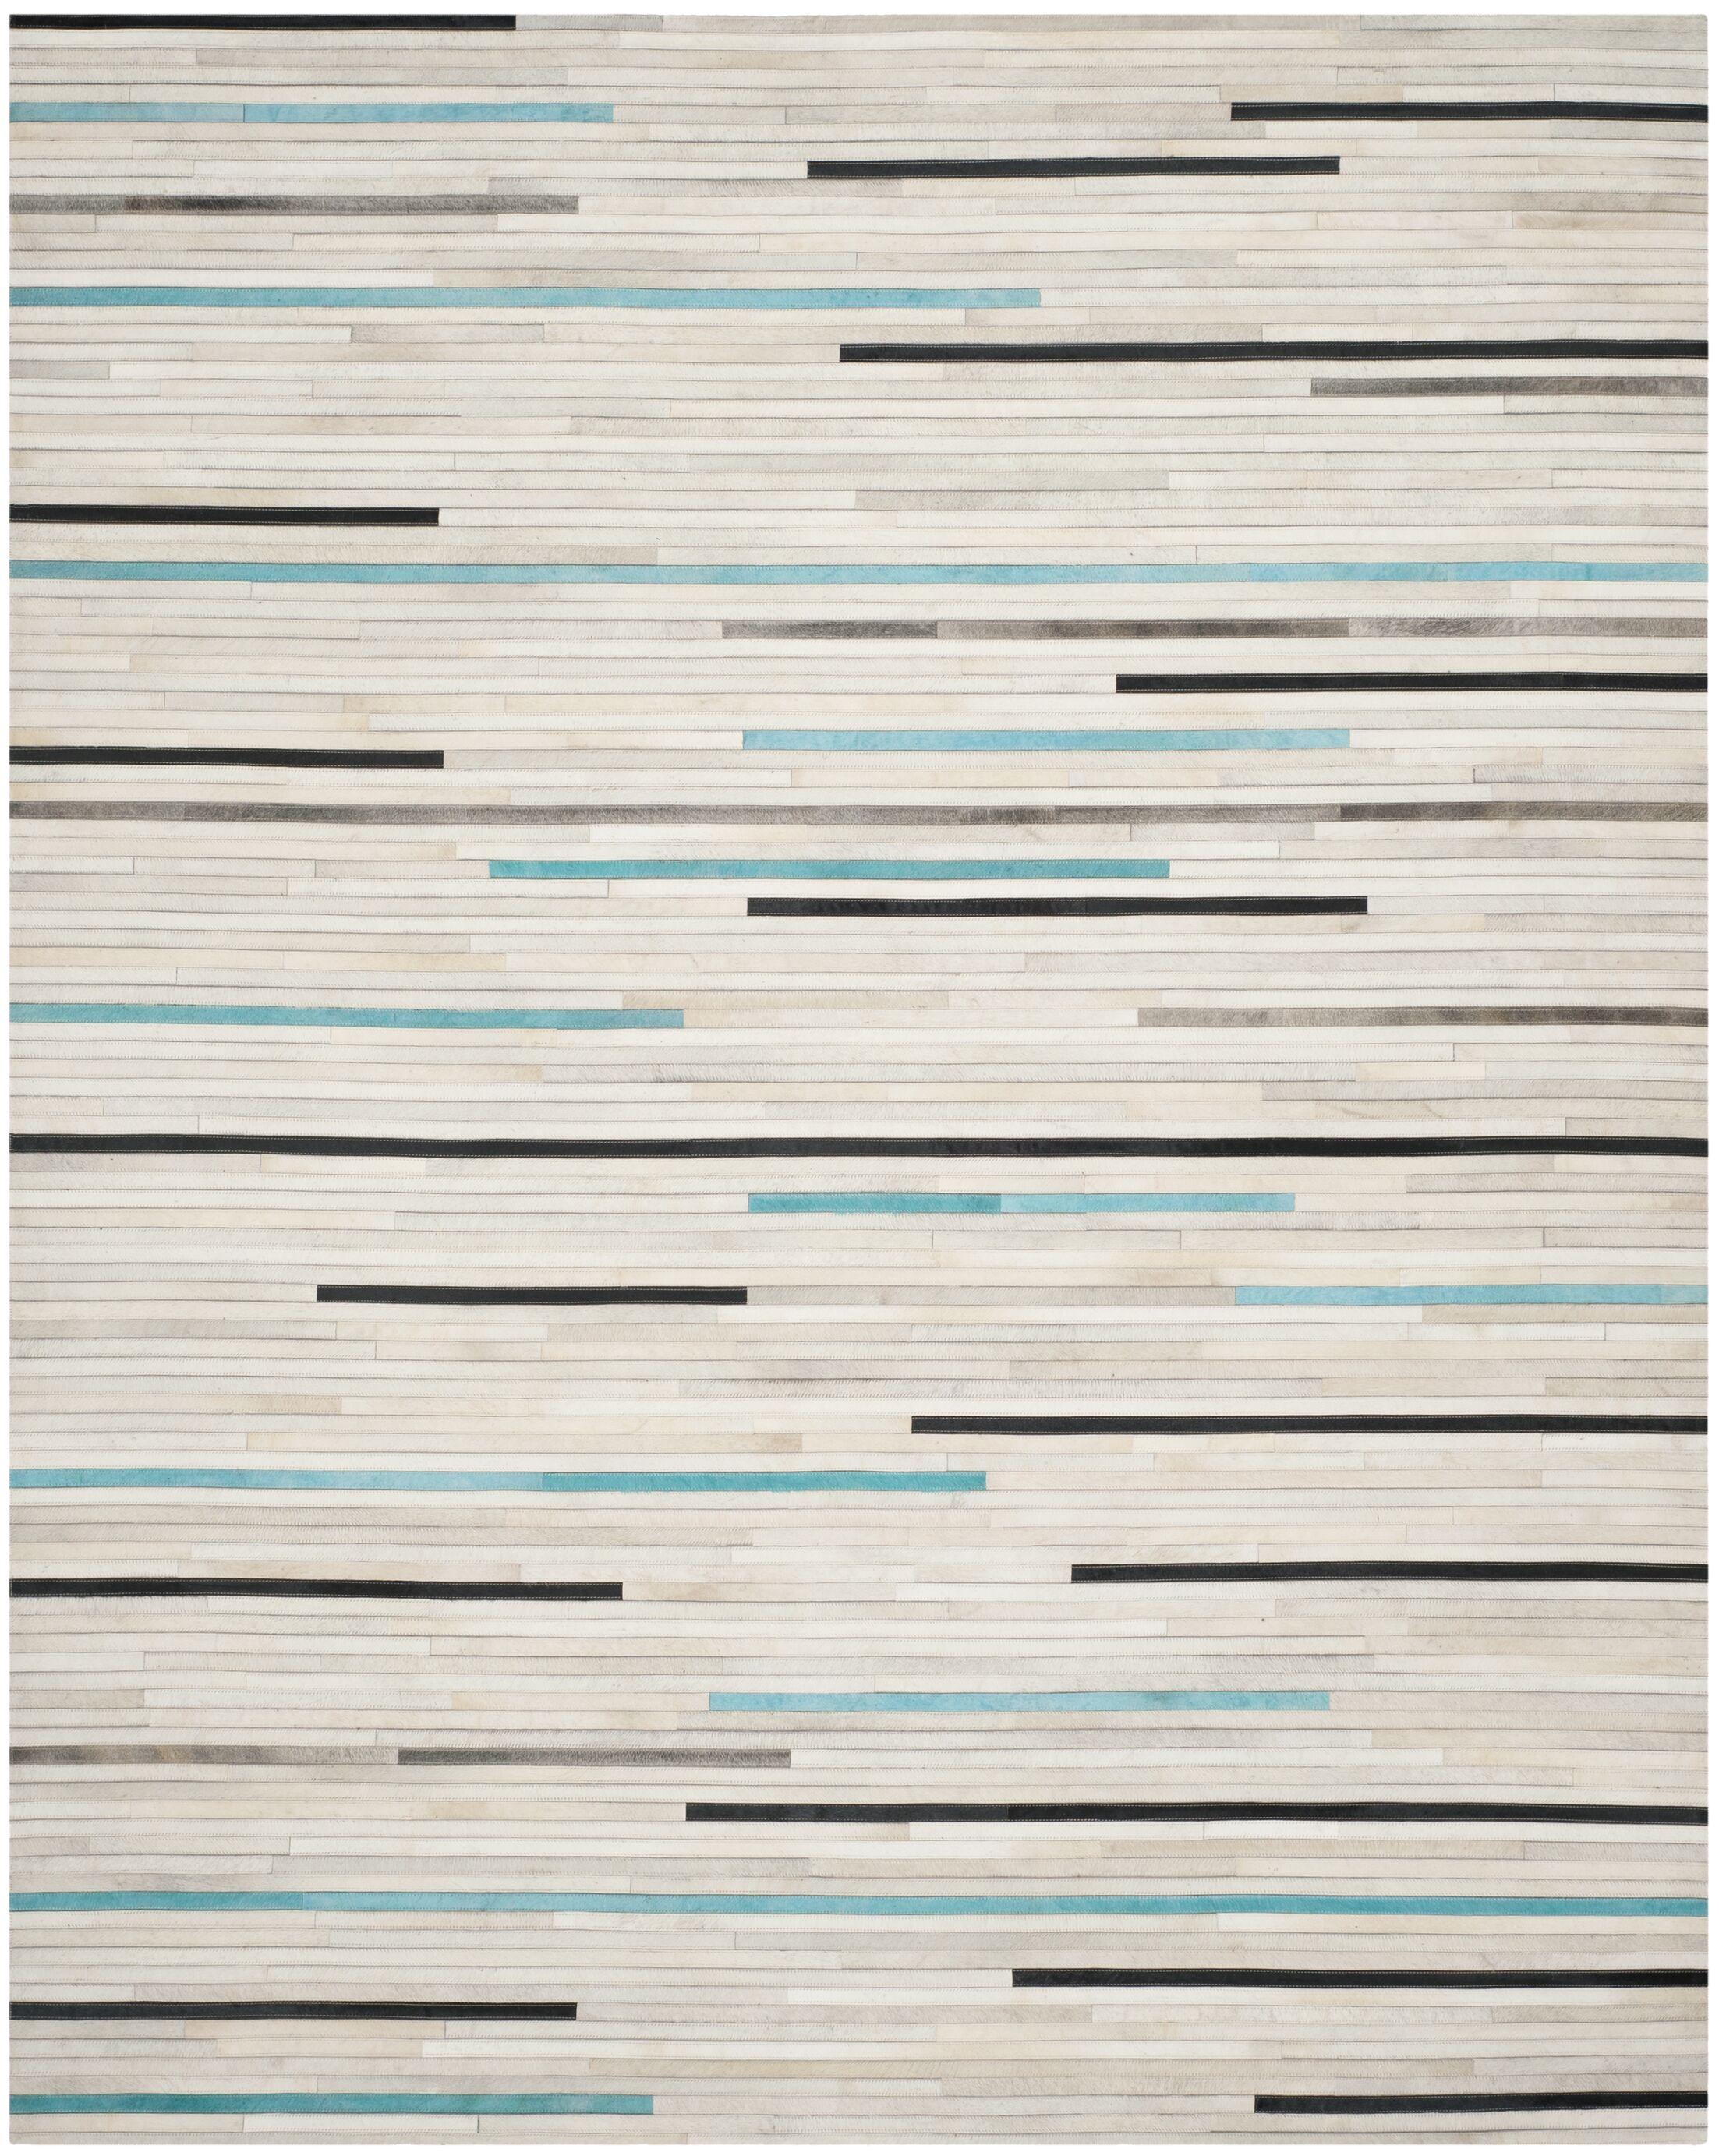 Stasia Leather Multi Contemporary Area Rug Rug Size: Rectangle 8' x 10'